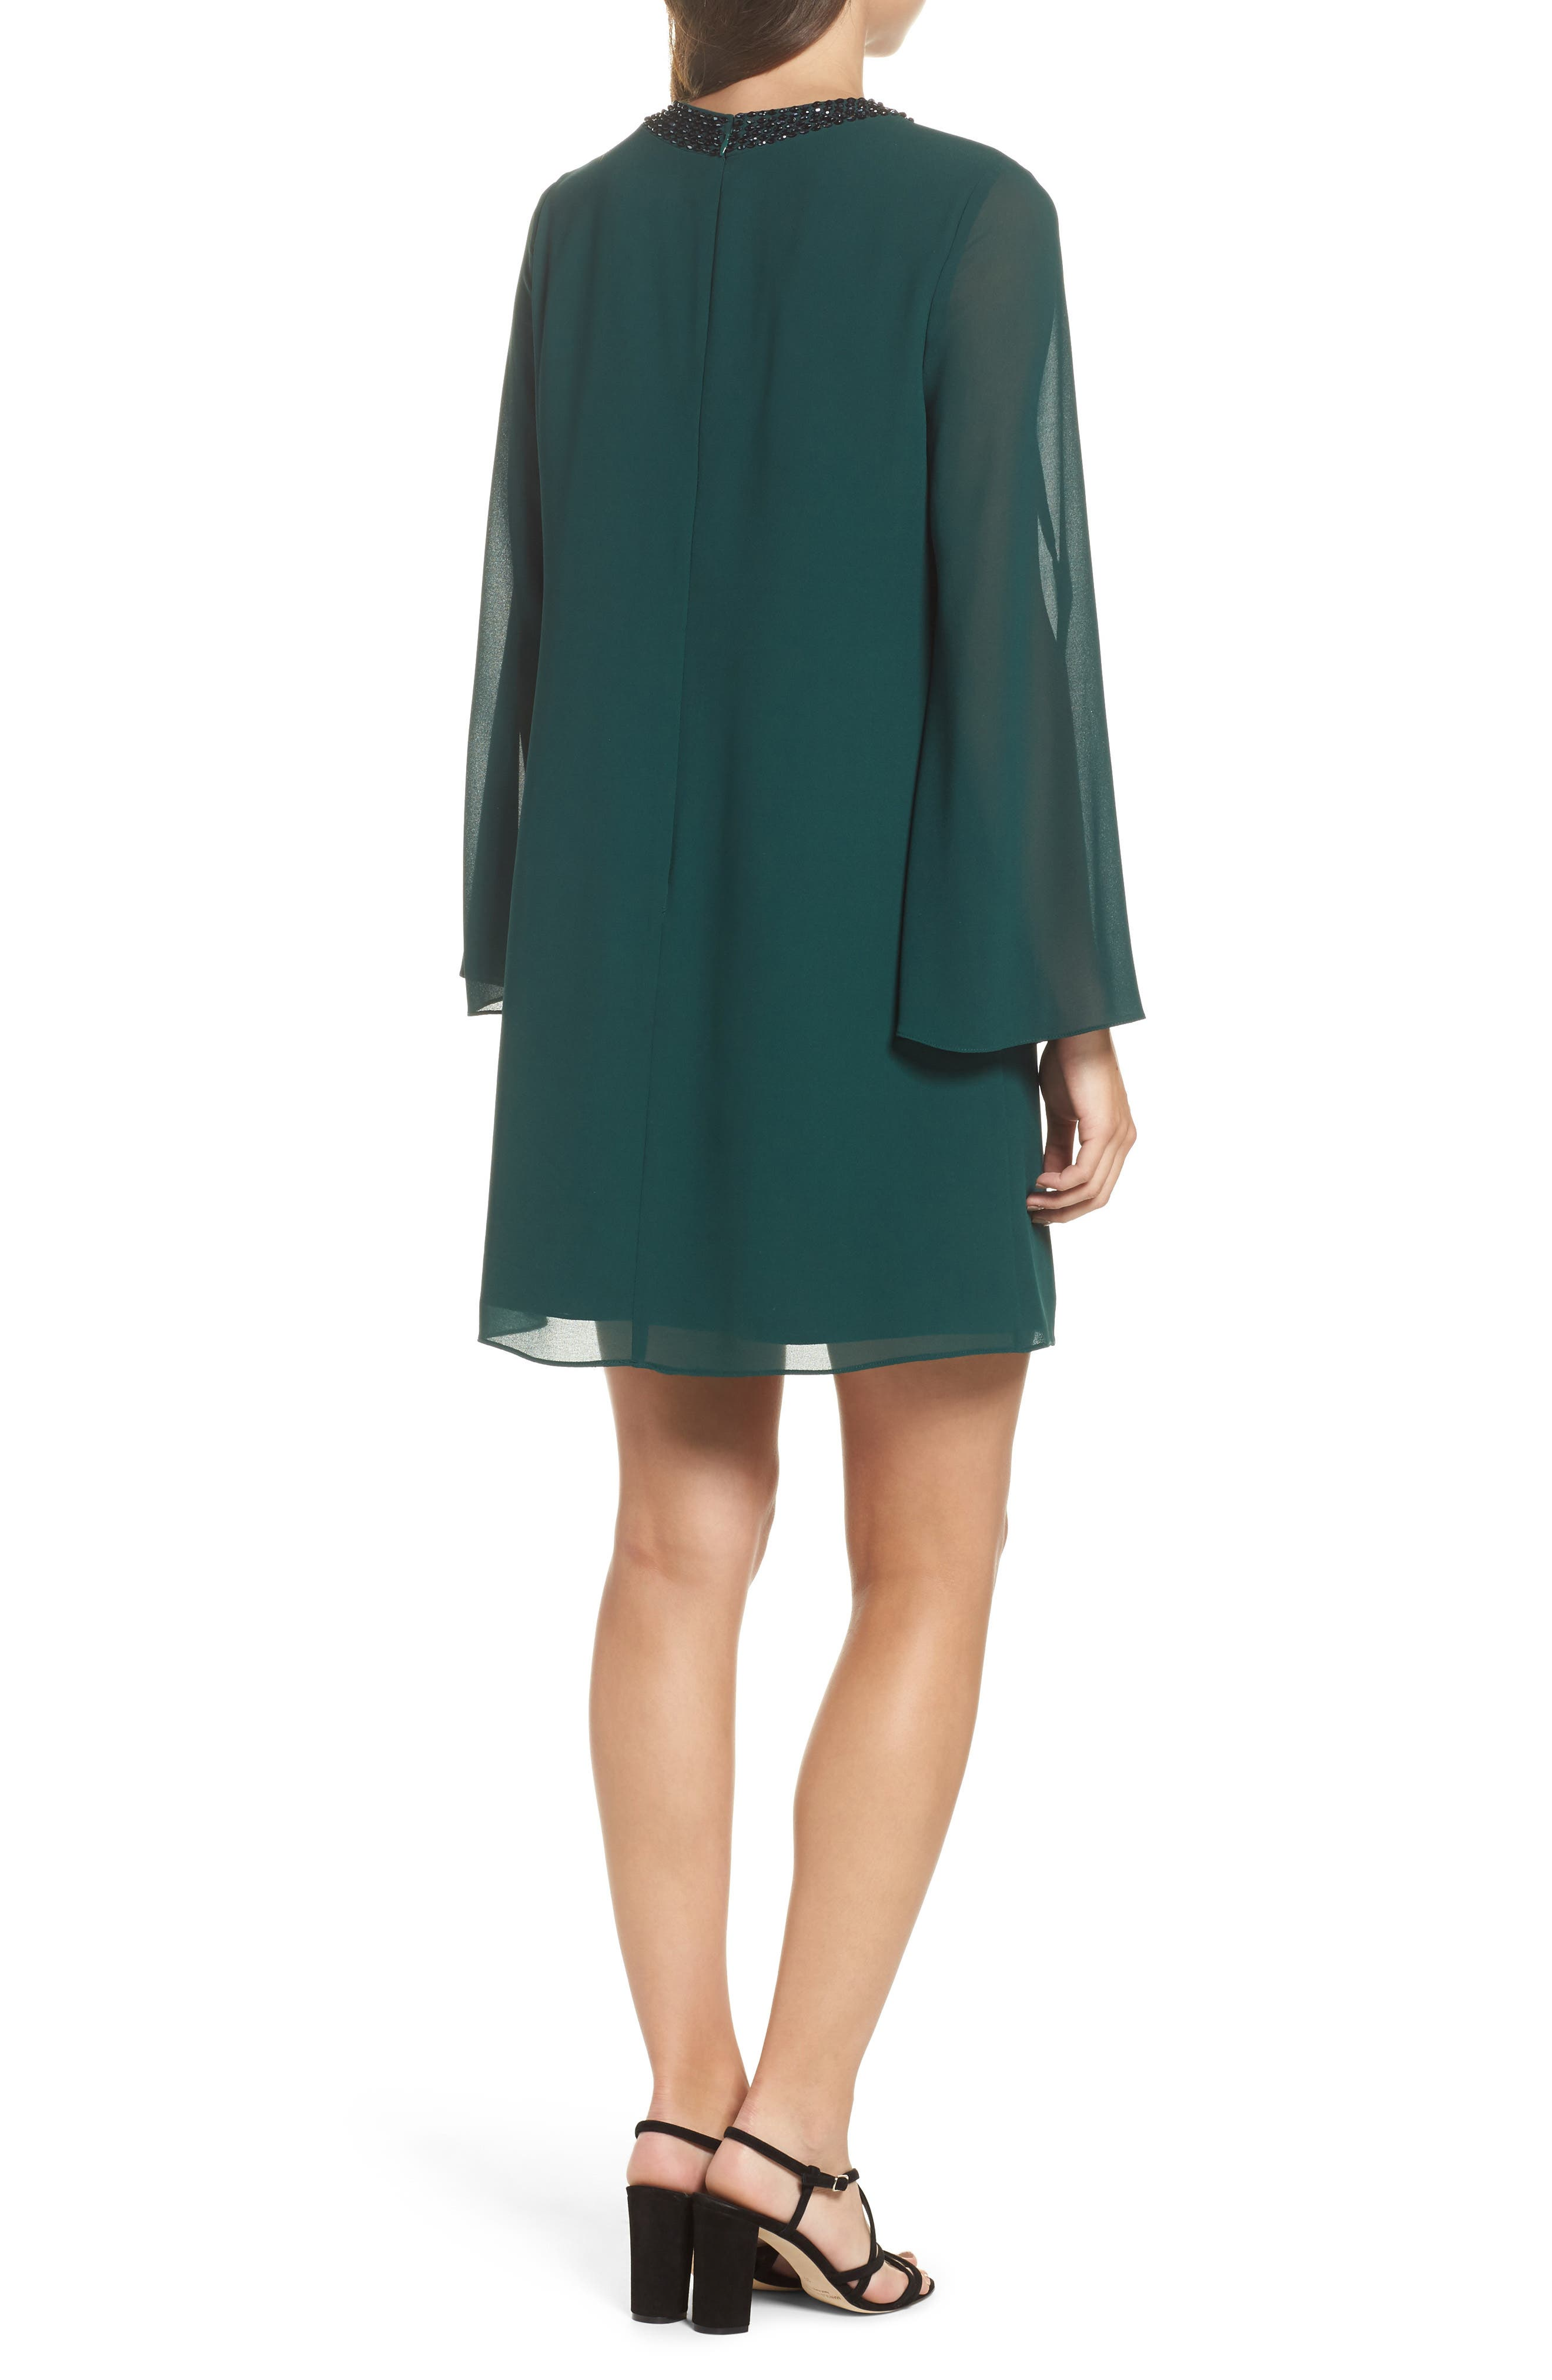 Embellished Chiffon Shift Dress,                             Alternate thumbnail 2, color,                             302